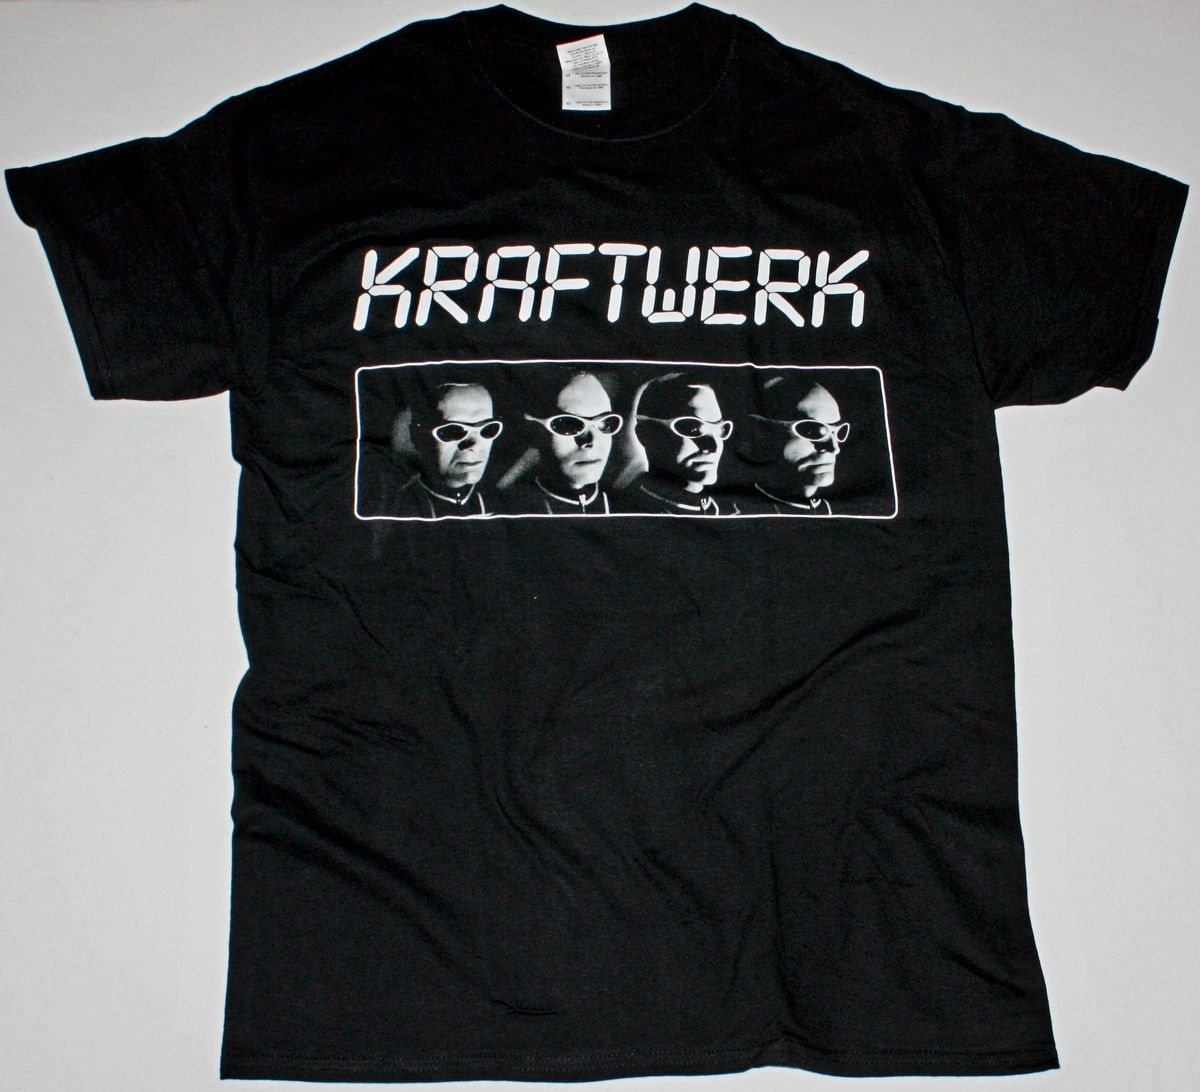 KRAFTWERK DEN ATELIER BLACK T-SHIRT ELECTRONIC SYNTHPOP TECHNO MUSIC